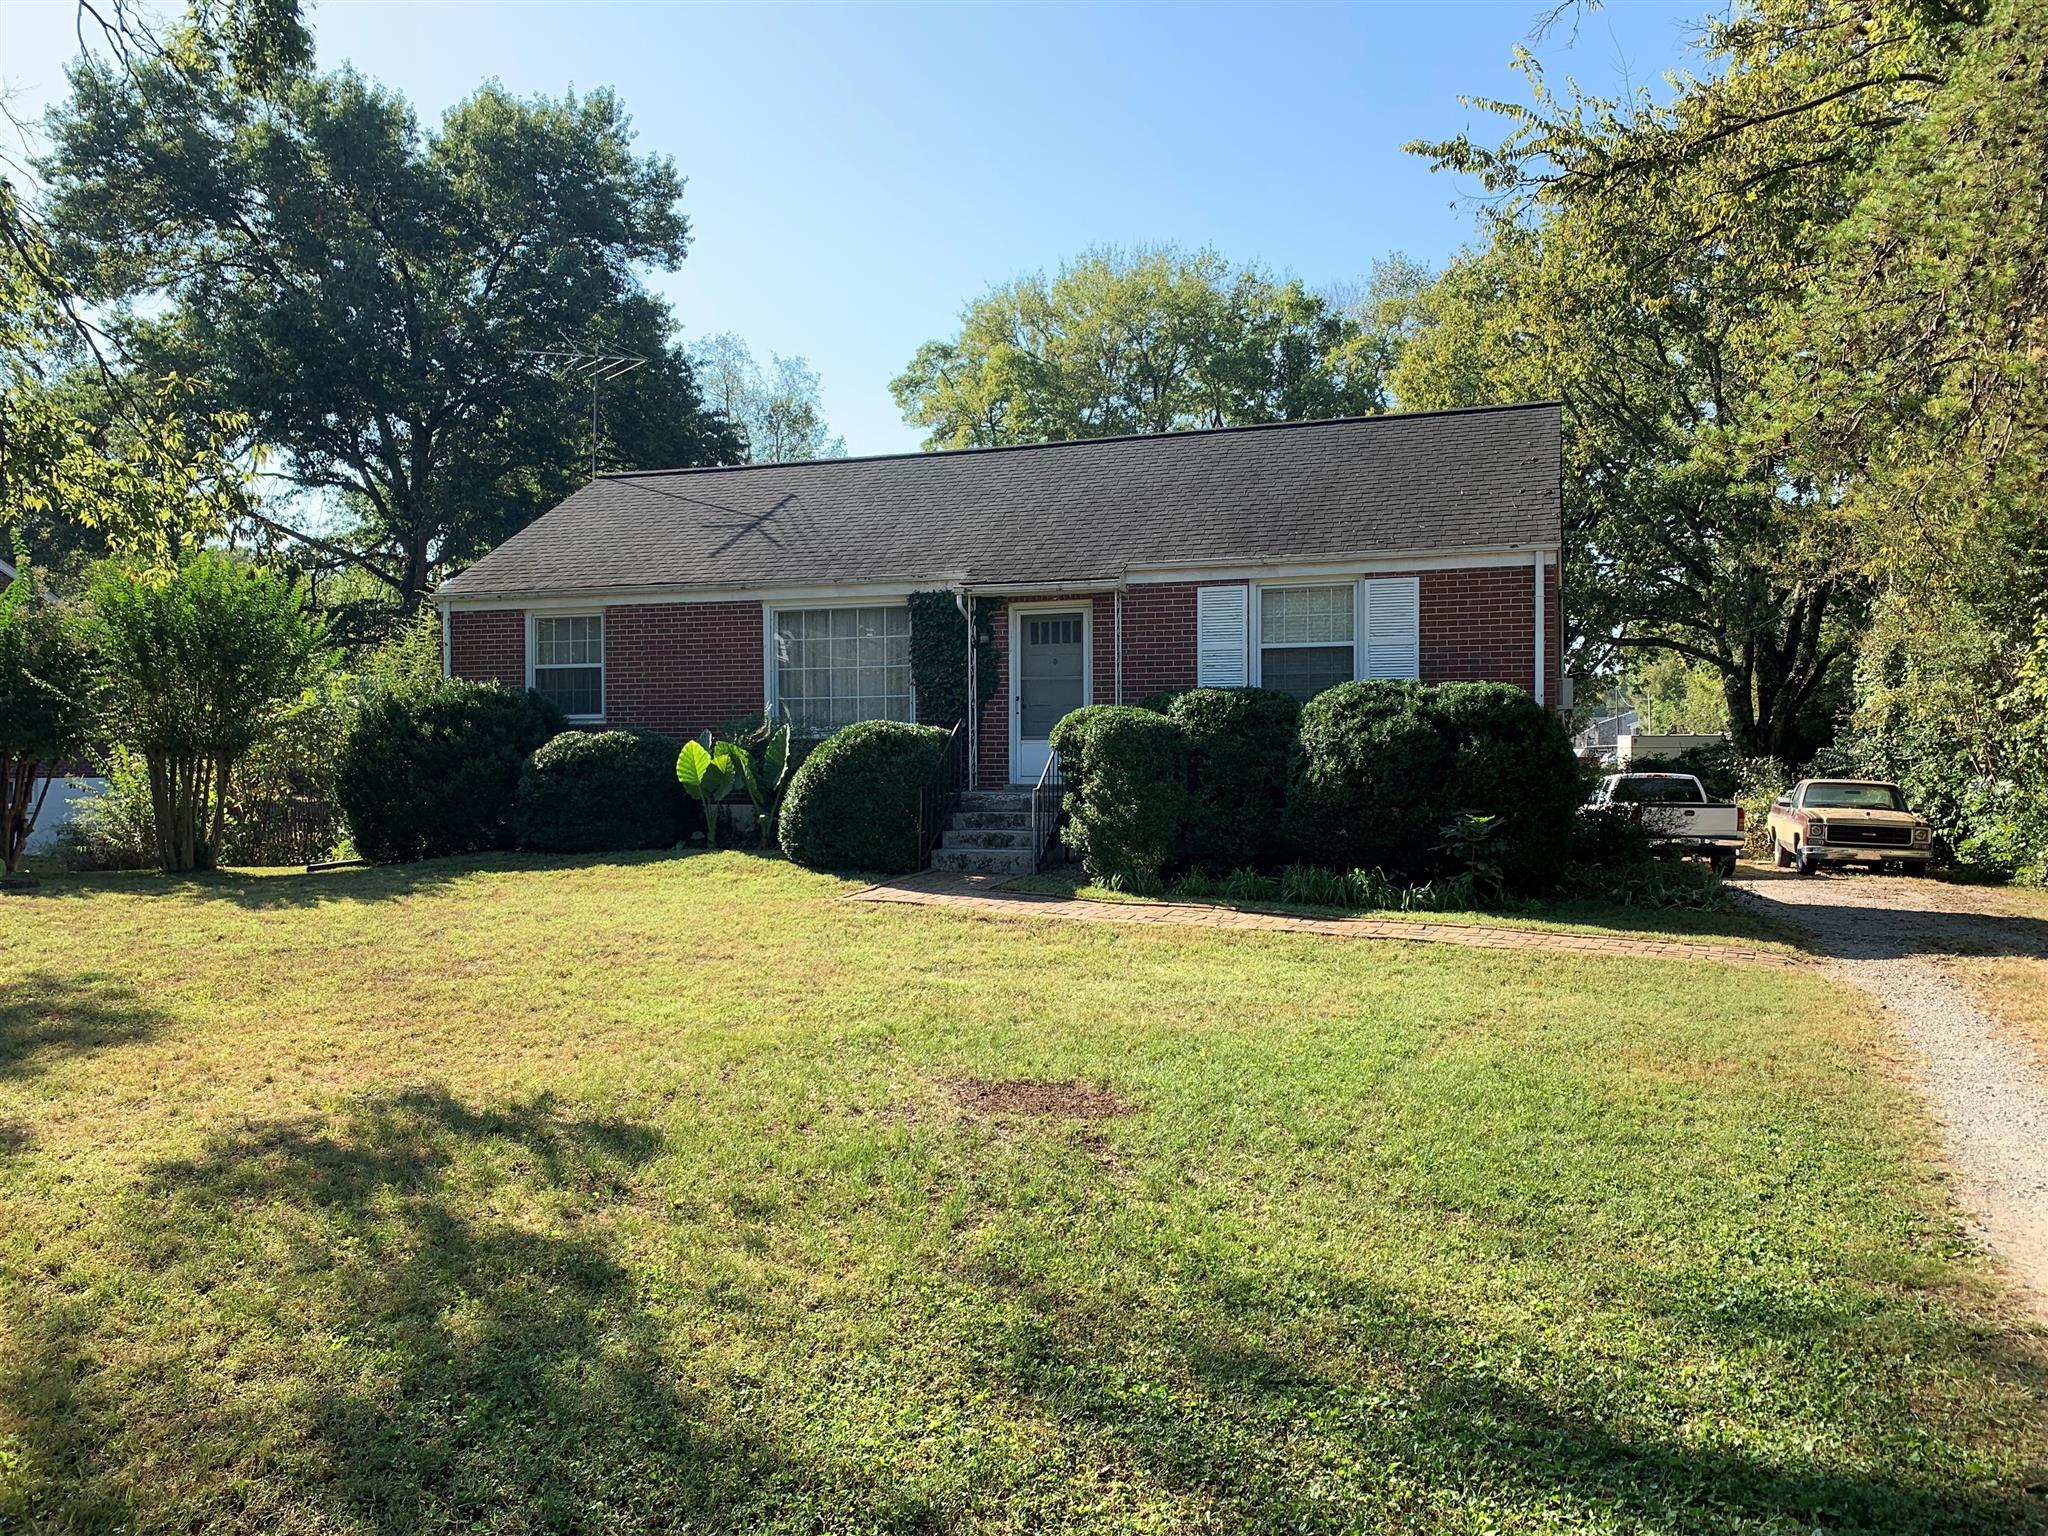 111 Battle Ave, Franklin, TN 37064 - Franklin, TN real estate listing